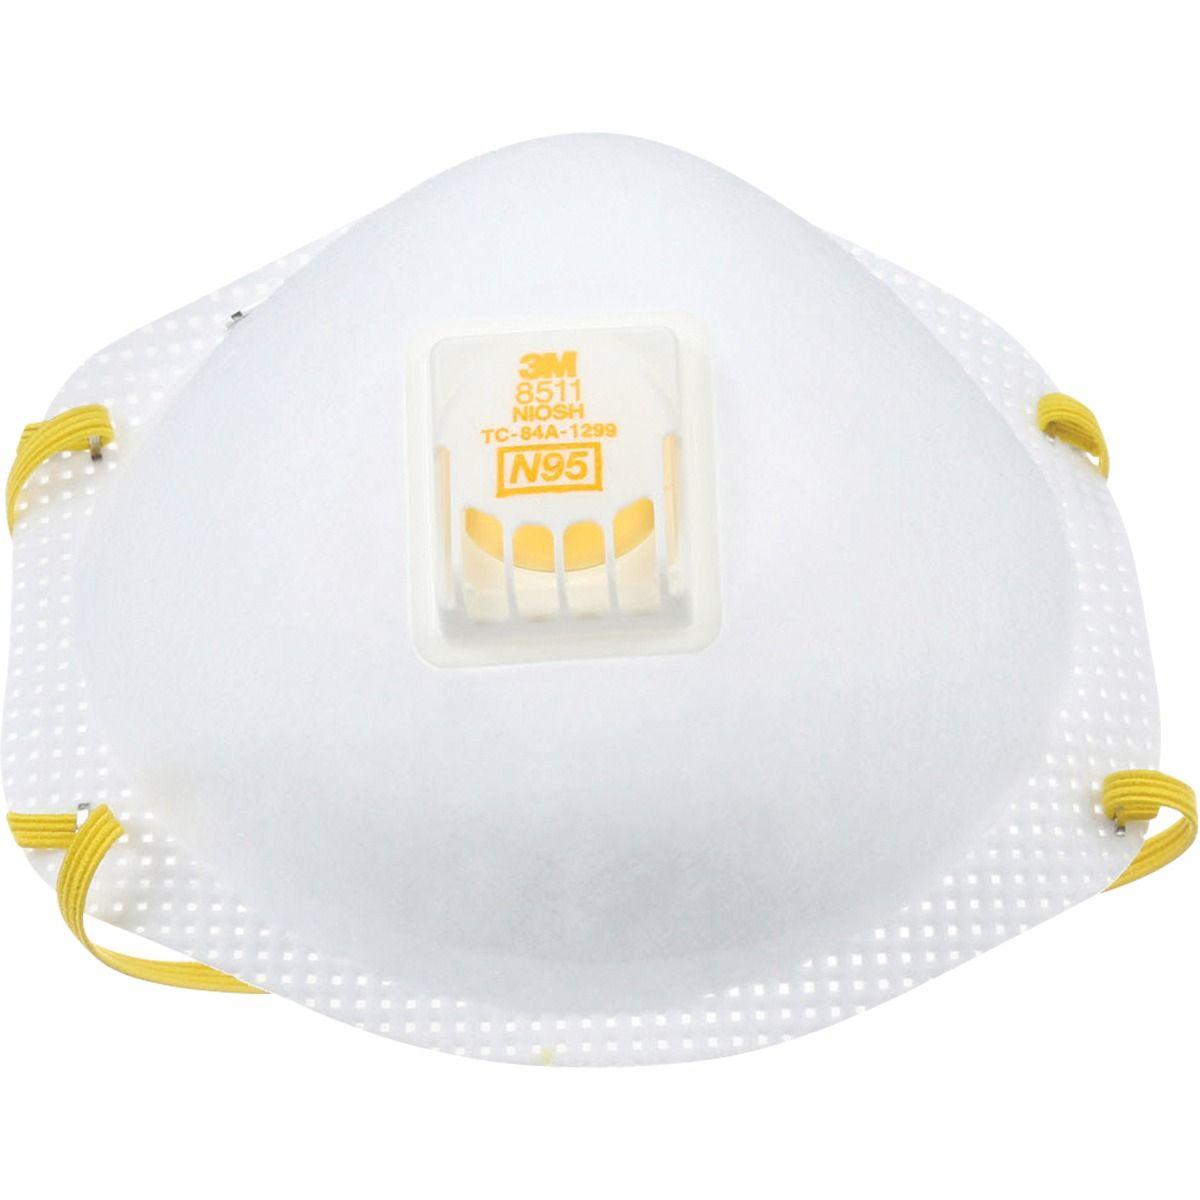 3M N95 Particulate Respirators 10 Count